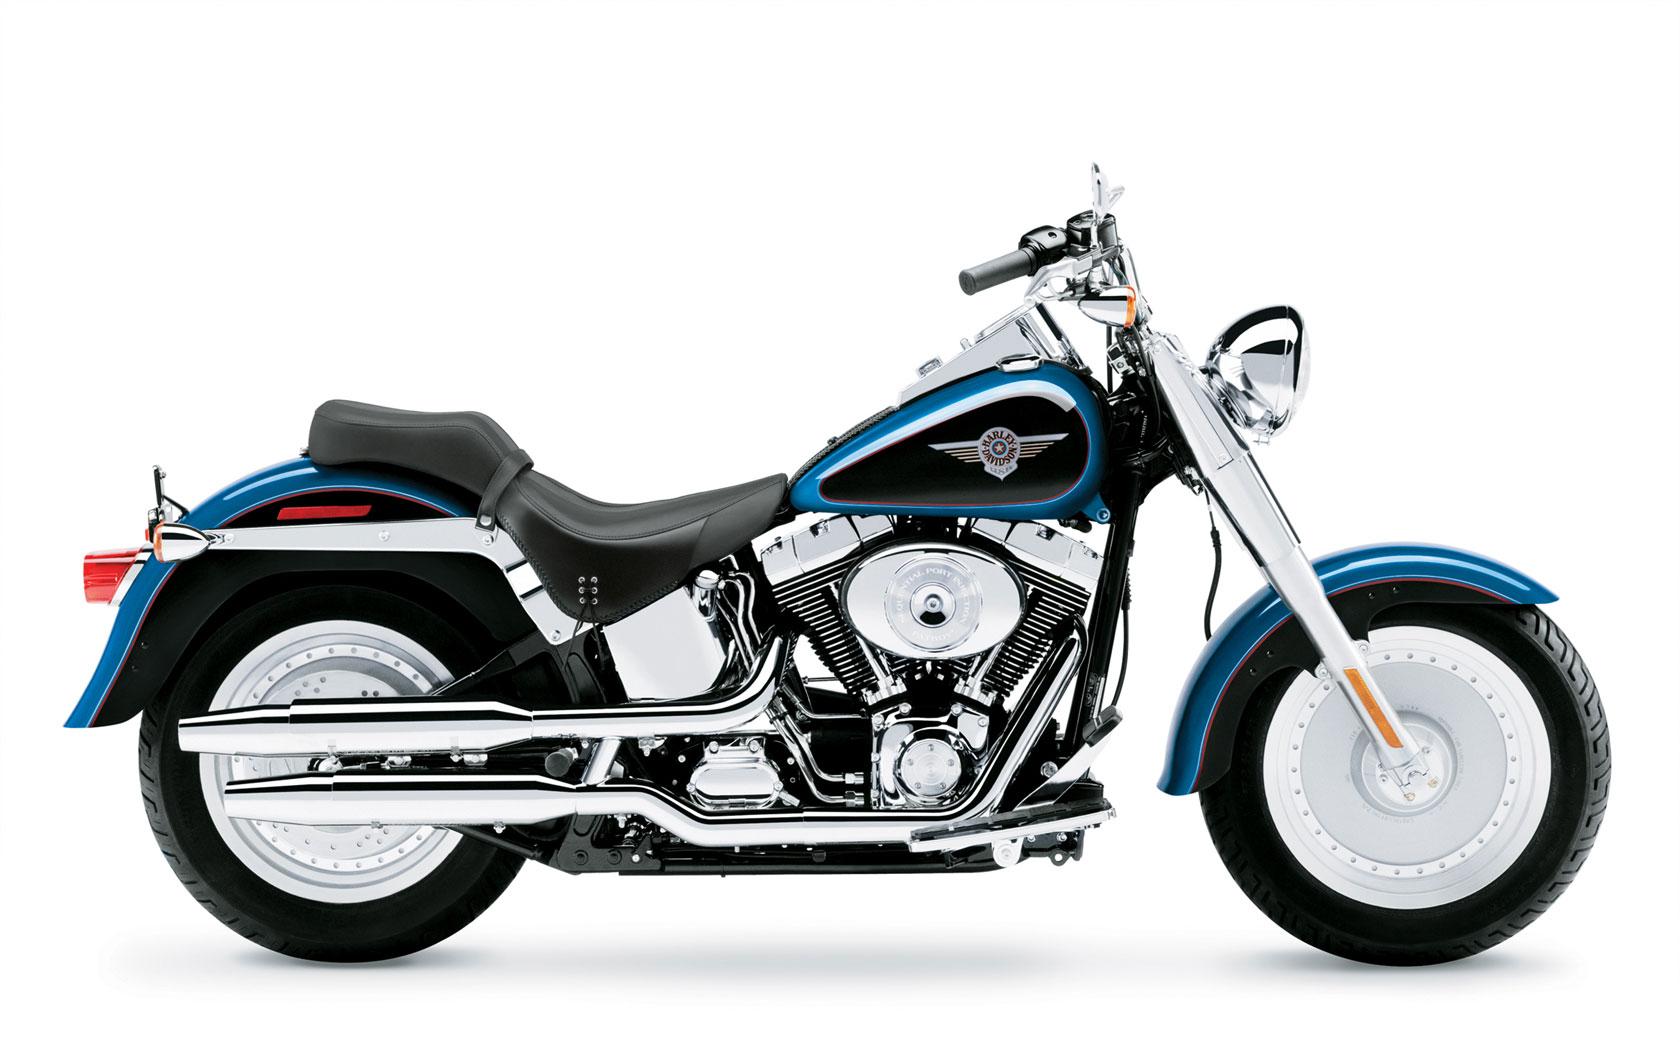 Peachy Harley Davidson Fat Boy Specs 2003 2004 Autoevolution Creativecarmelina Interior Chair Design Creativecarmelinacom